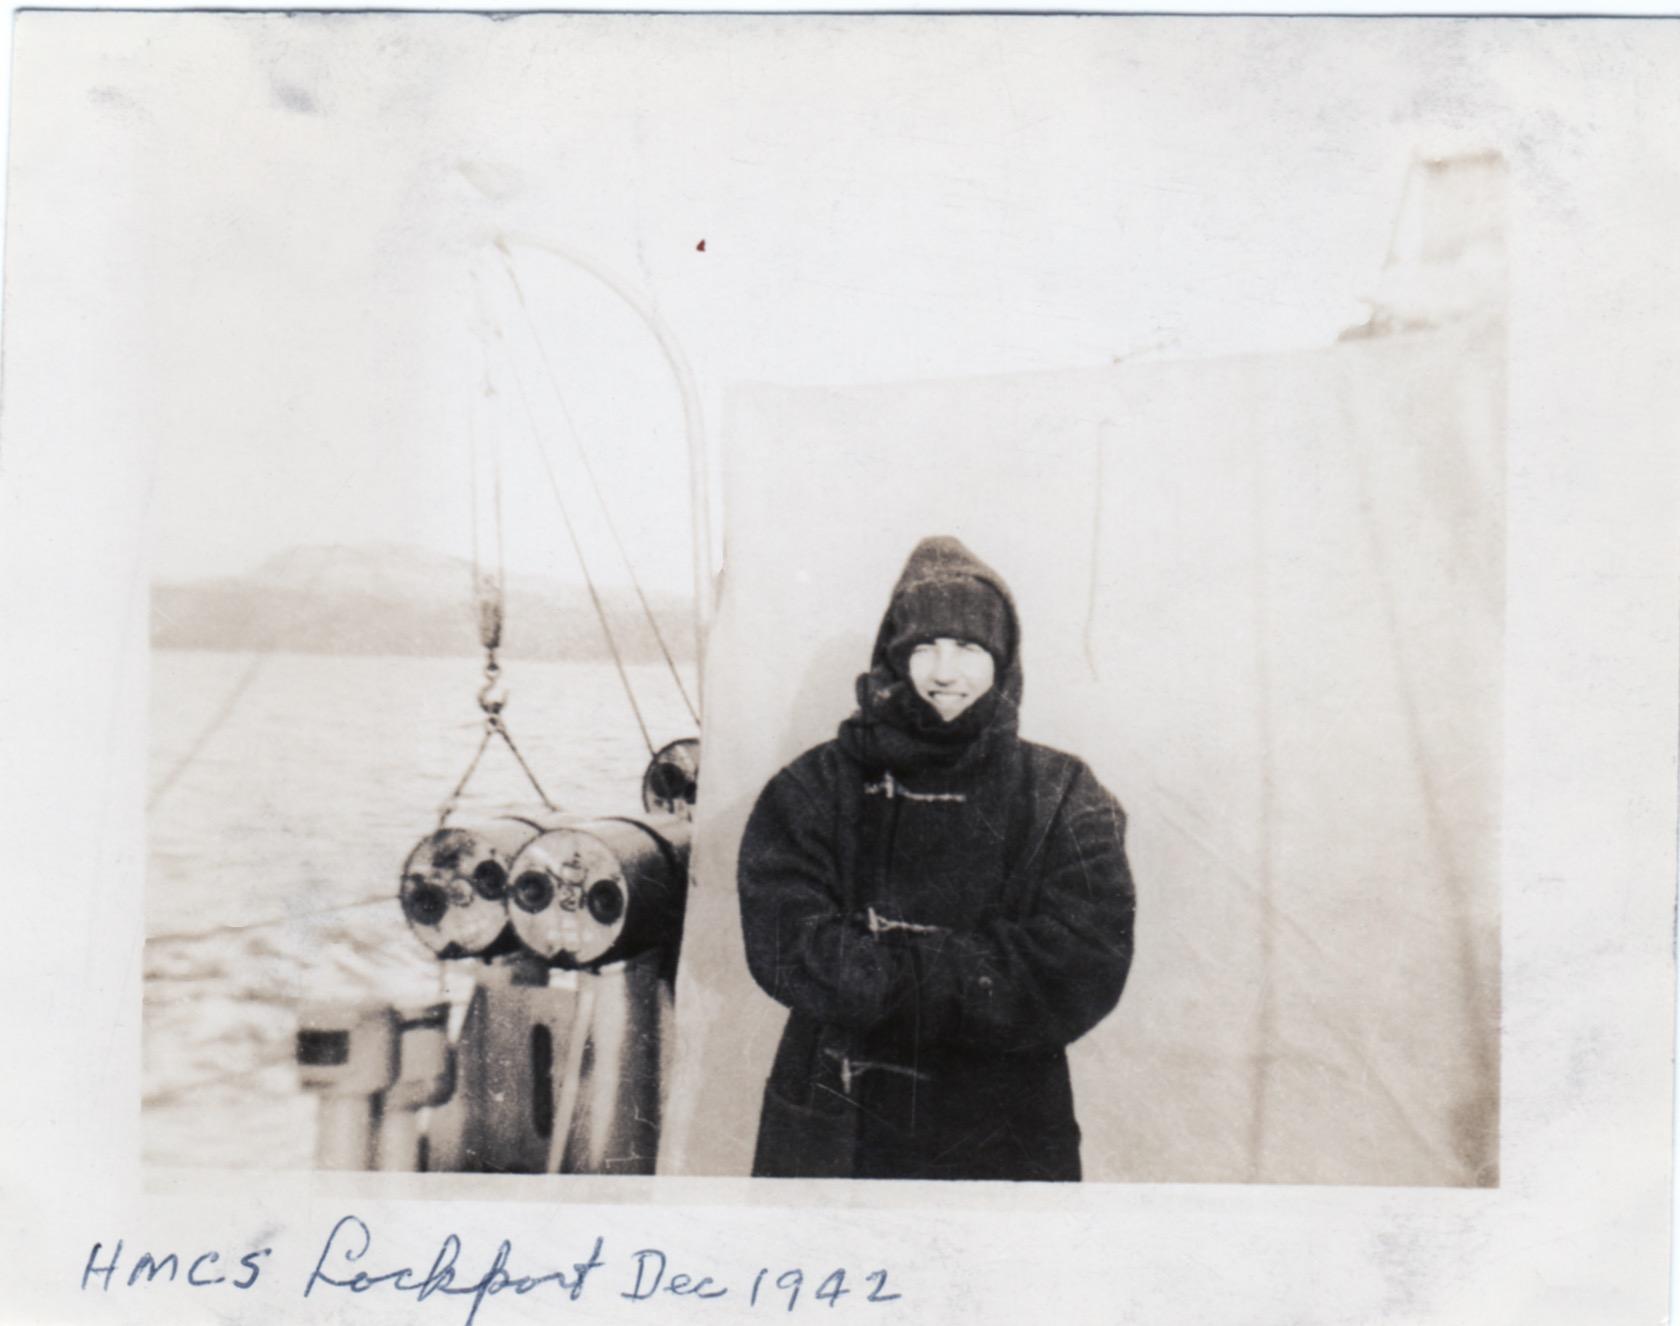 """HMCS Lockport Dec 1942"""